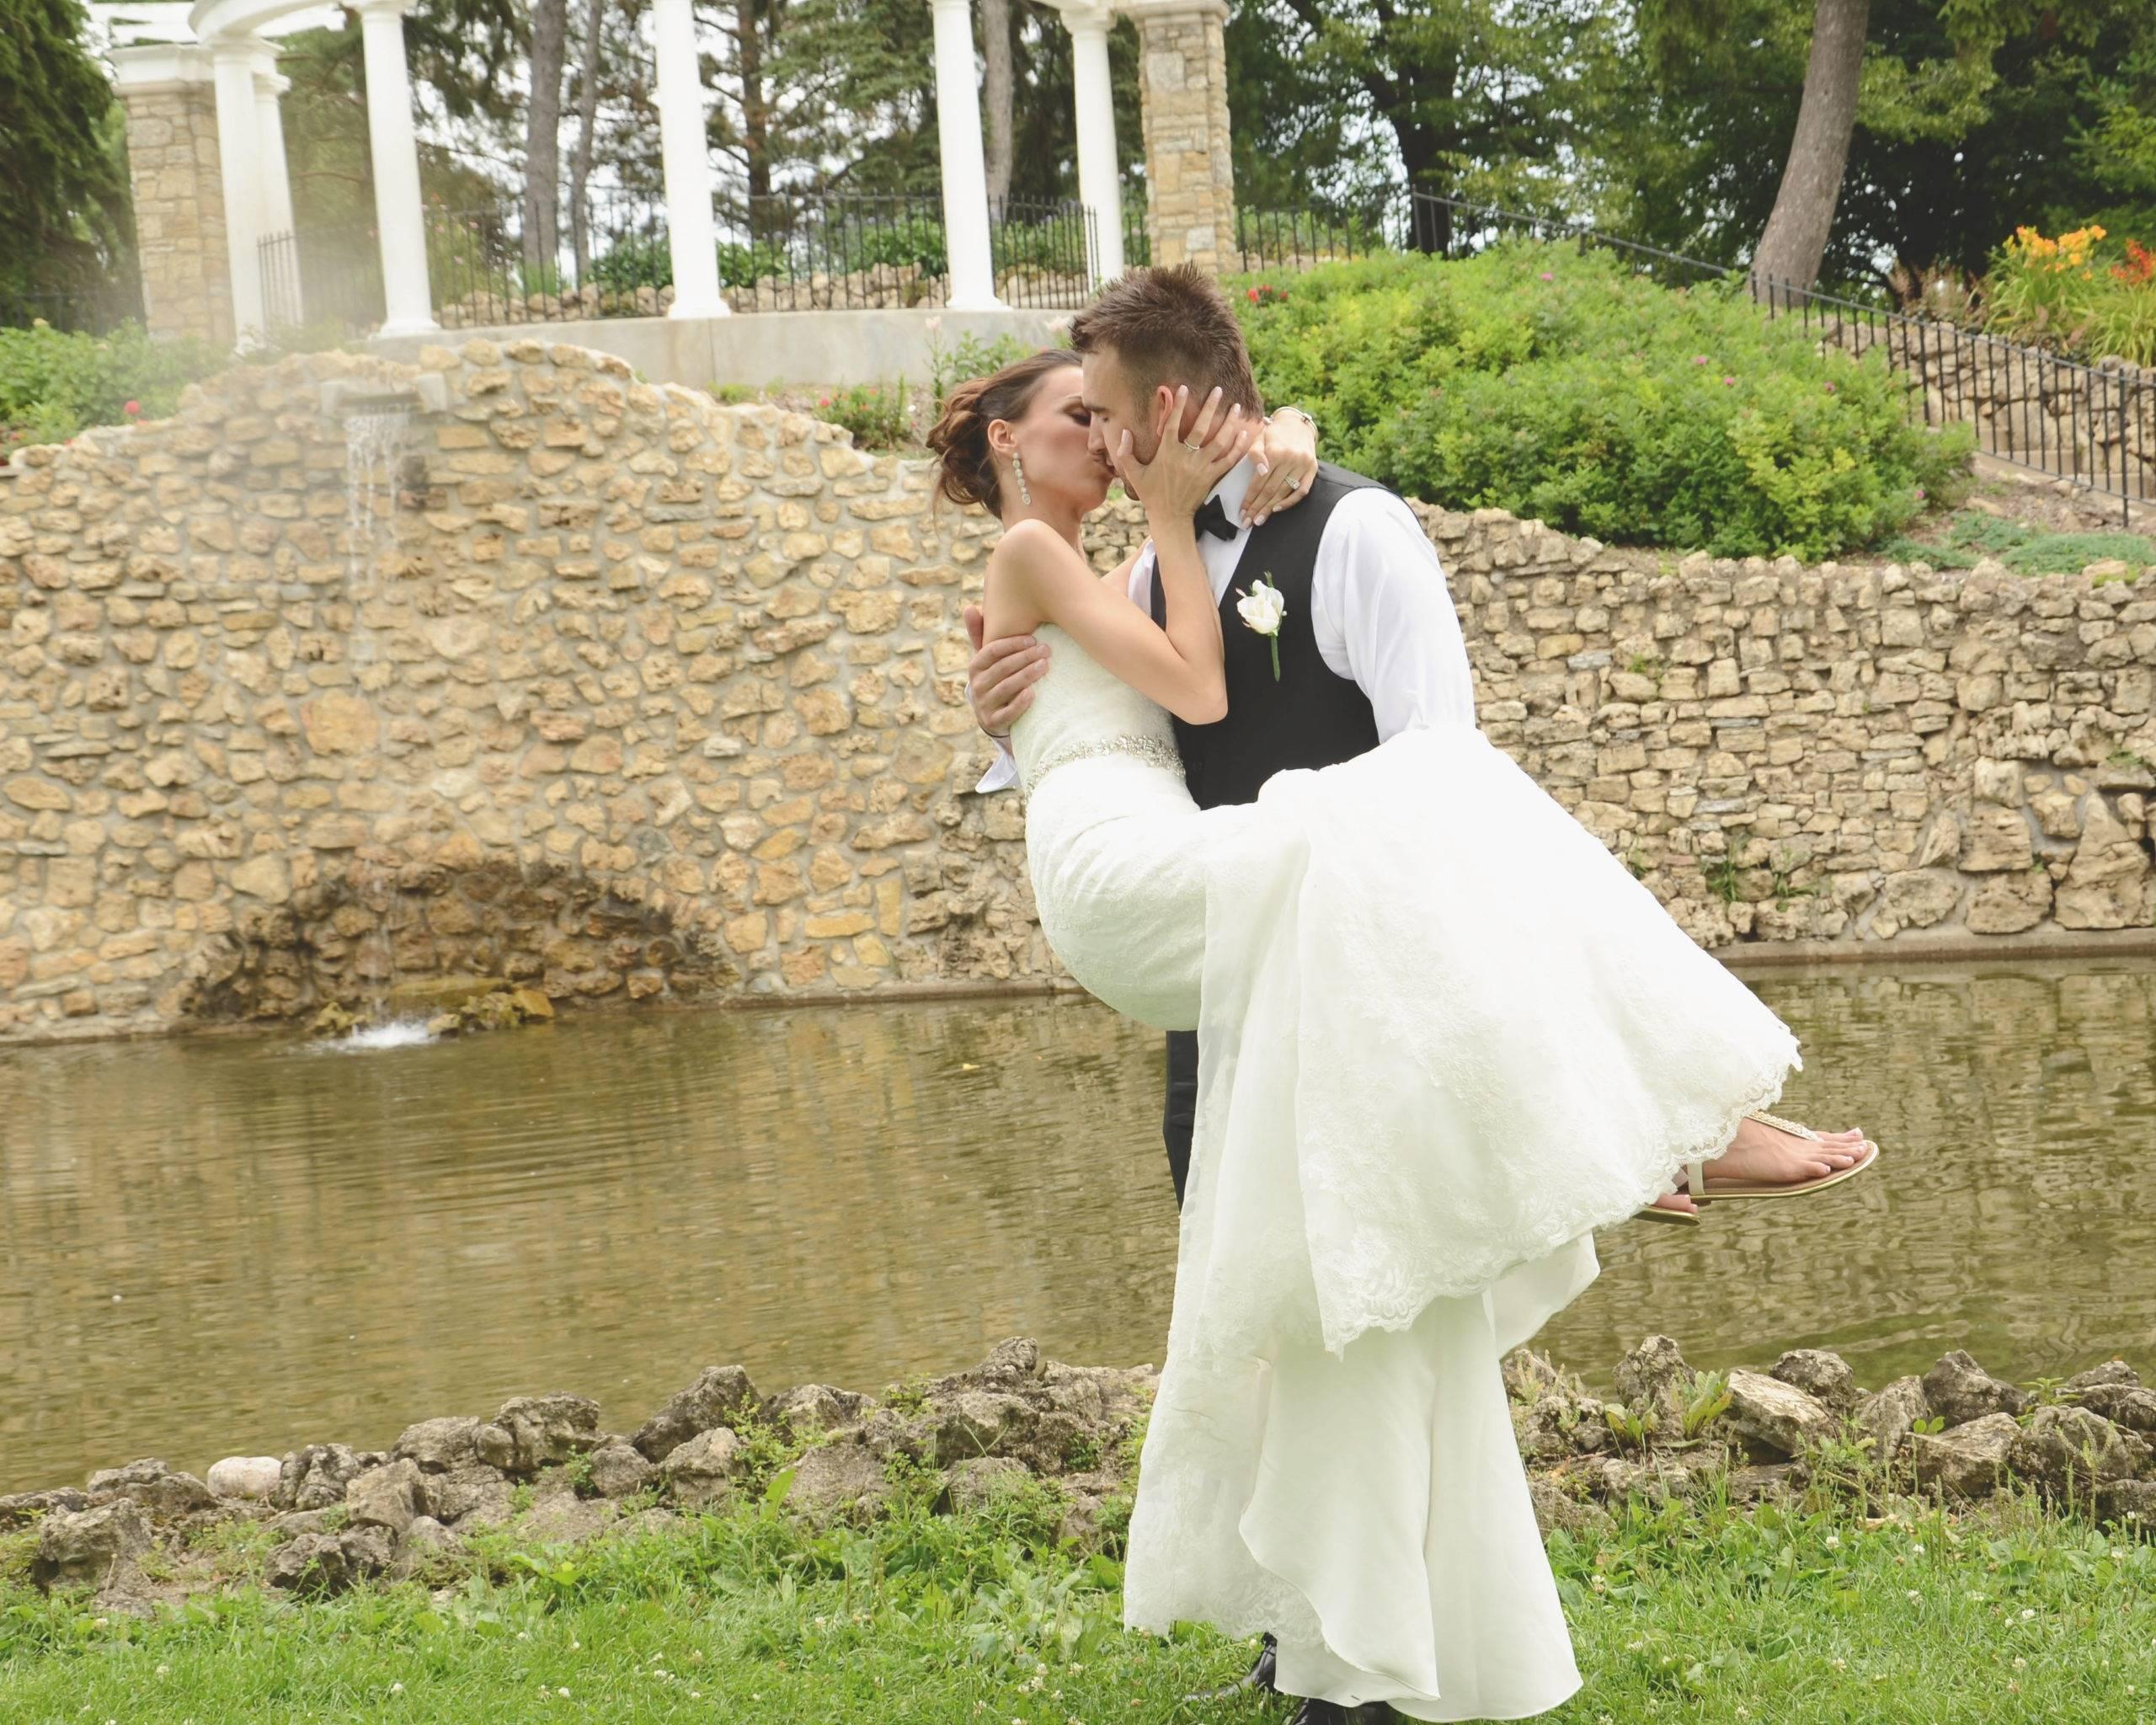 wedding photography, saint paul minnesota